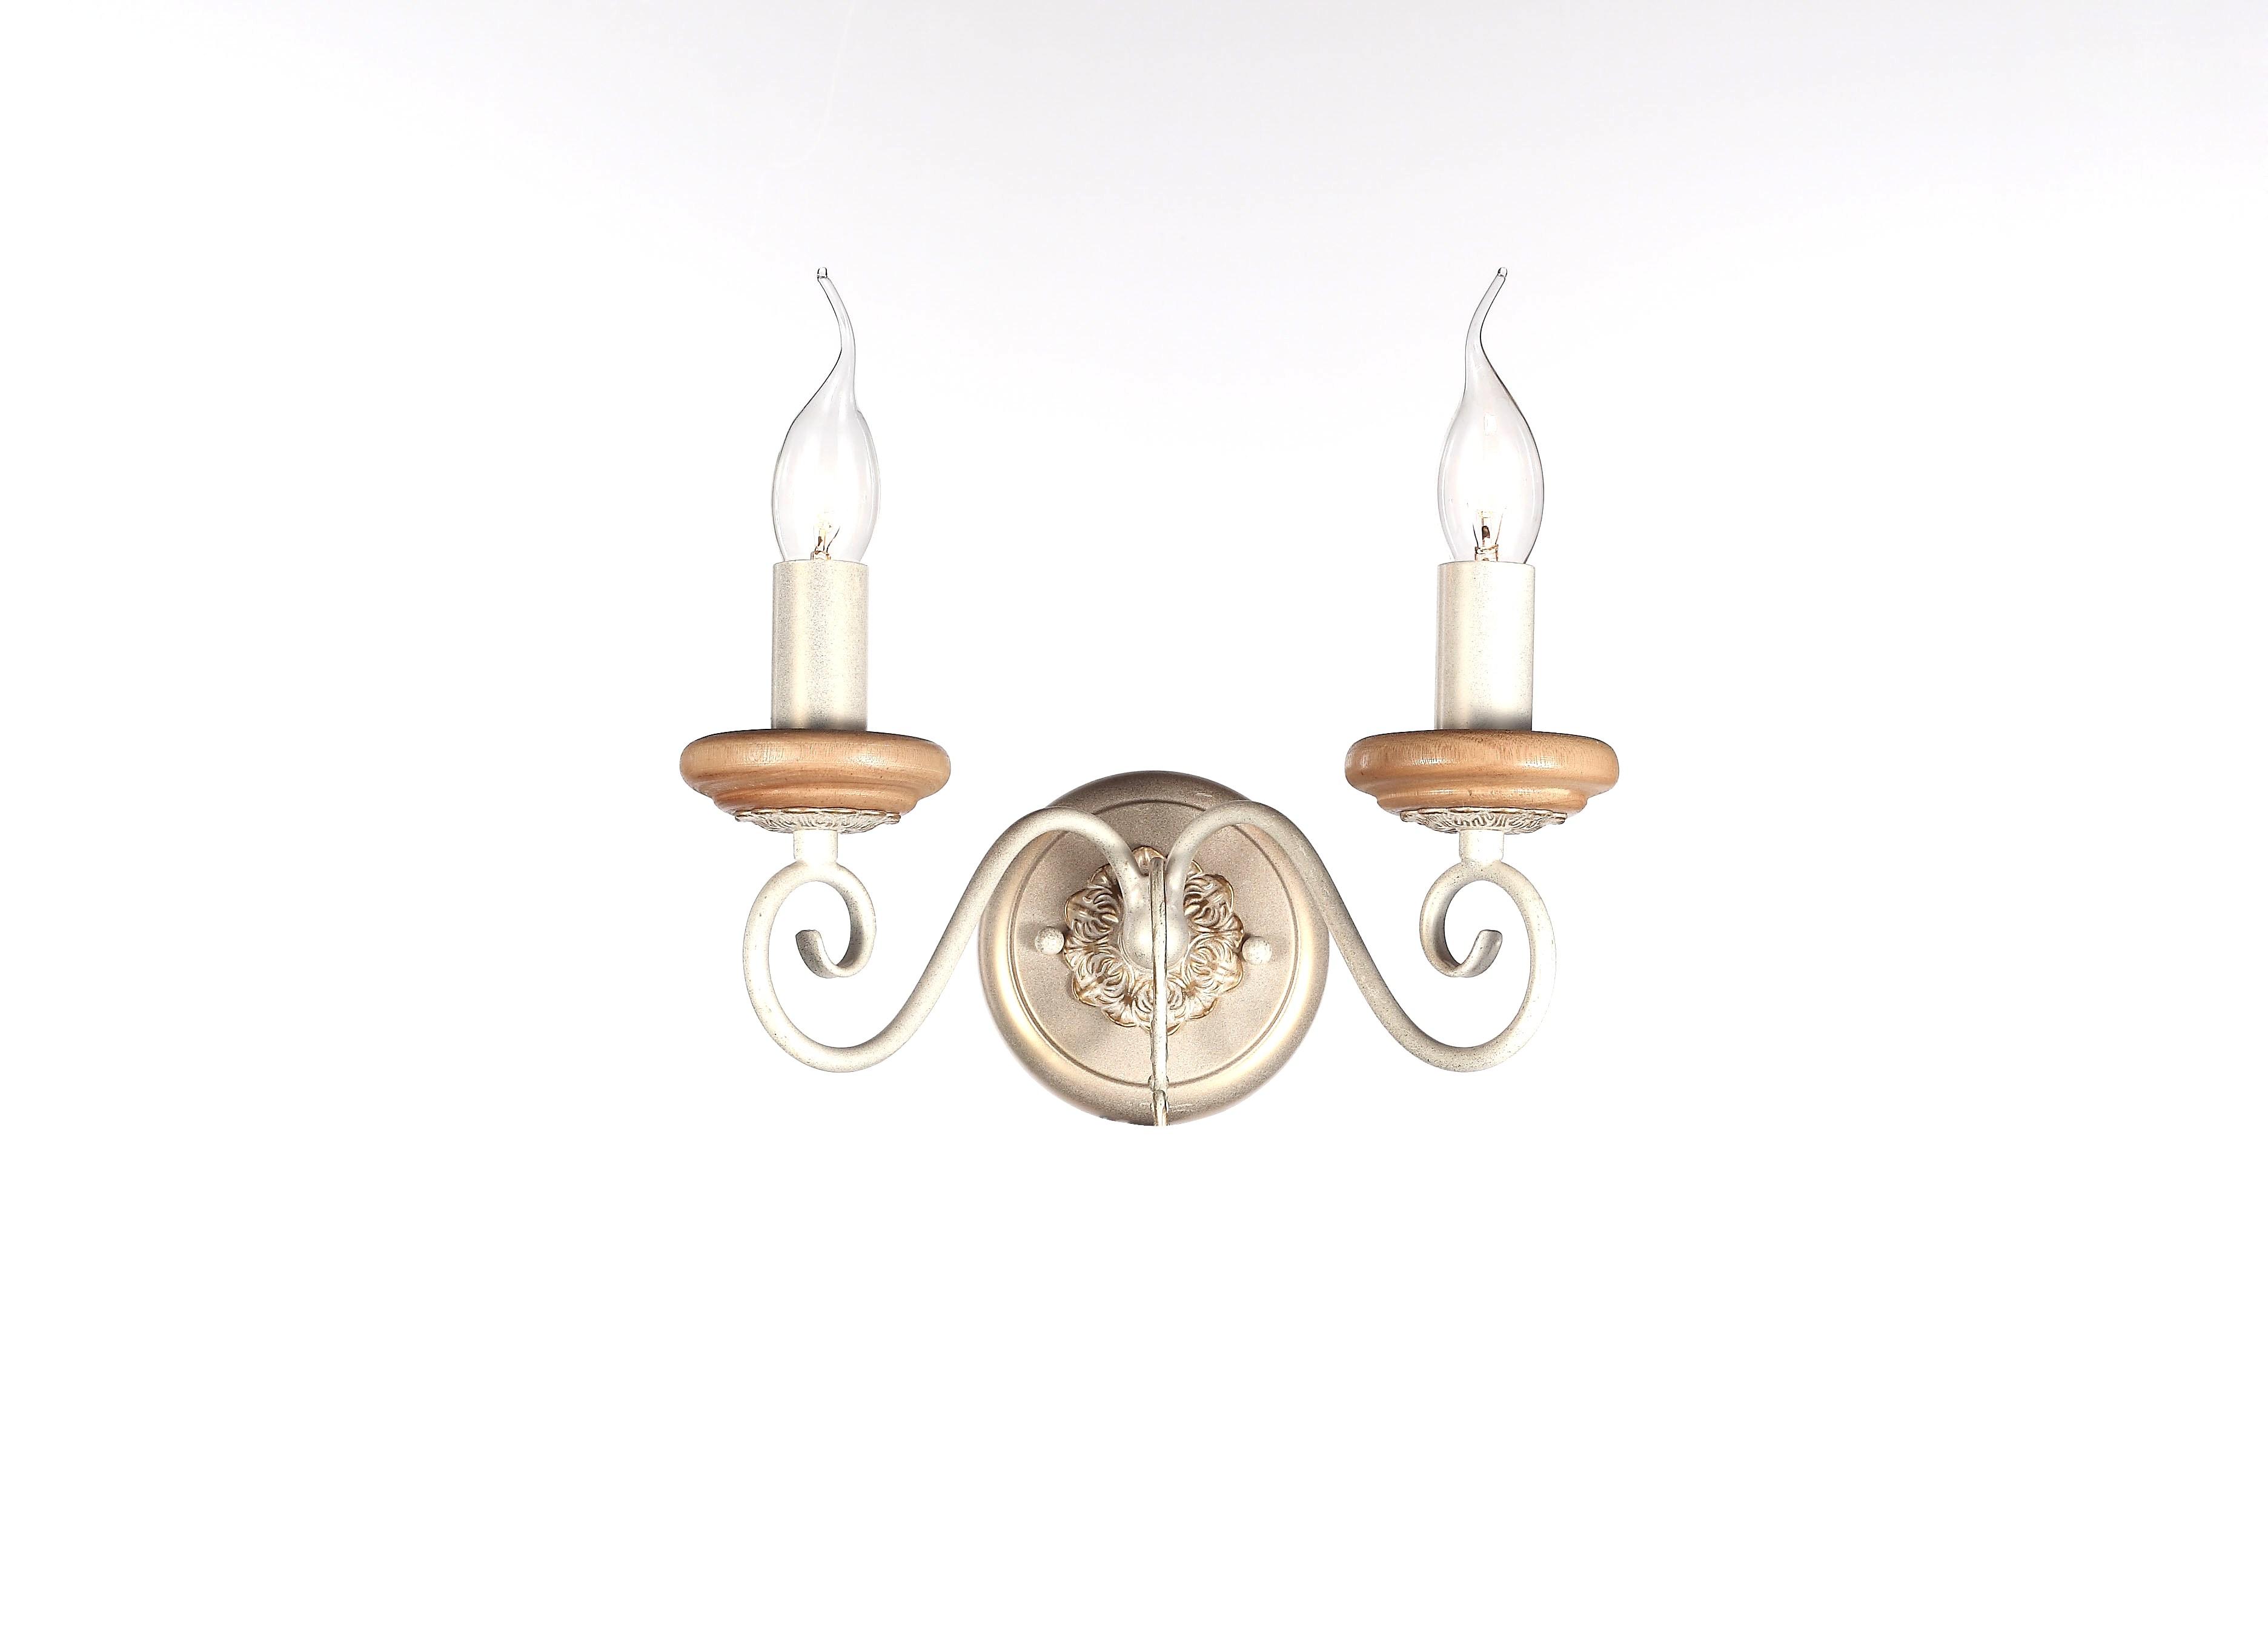 Бра Lamplandia 8599-2 rigato люстра lamplandia daria 3х40вт е14 металл темно коричневый